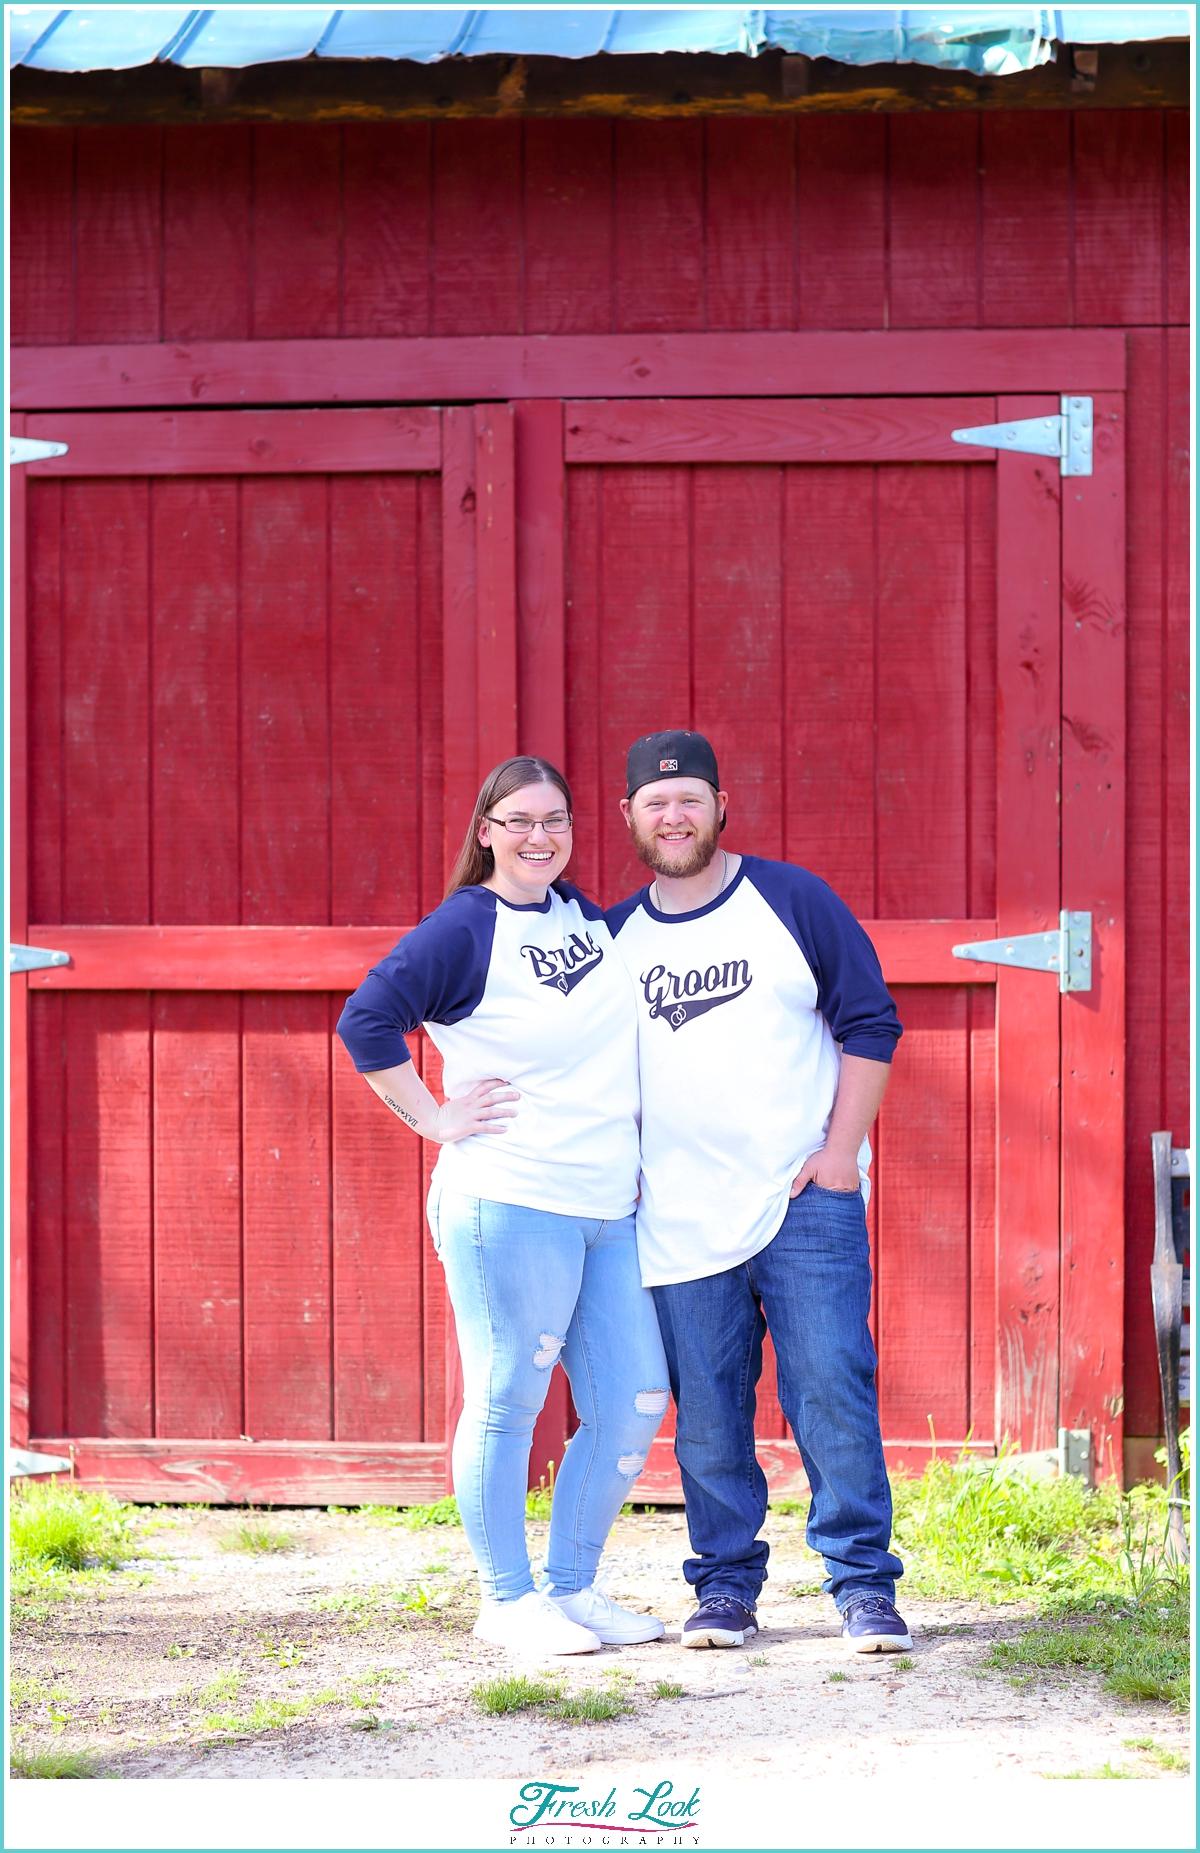 Bride and groom baseball teeshirts